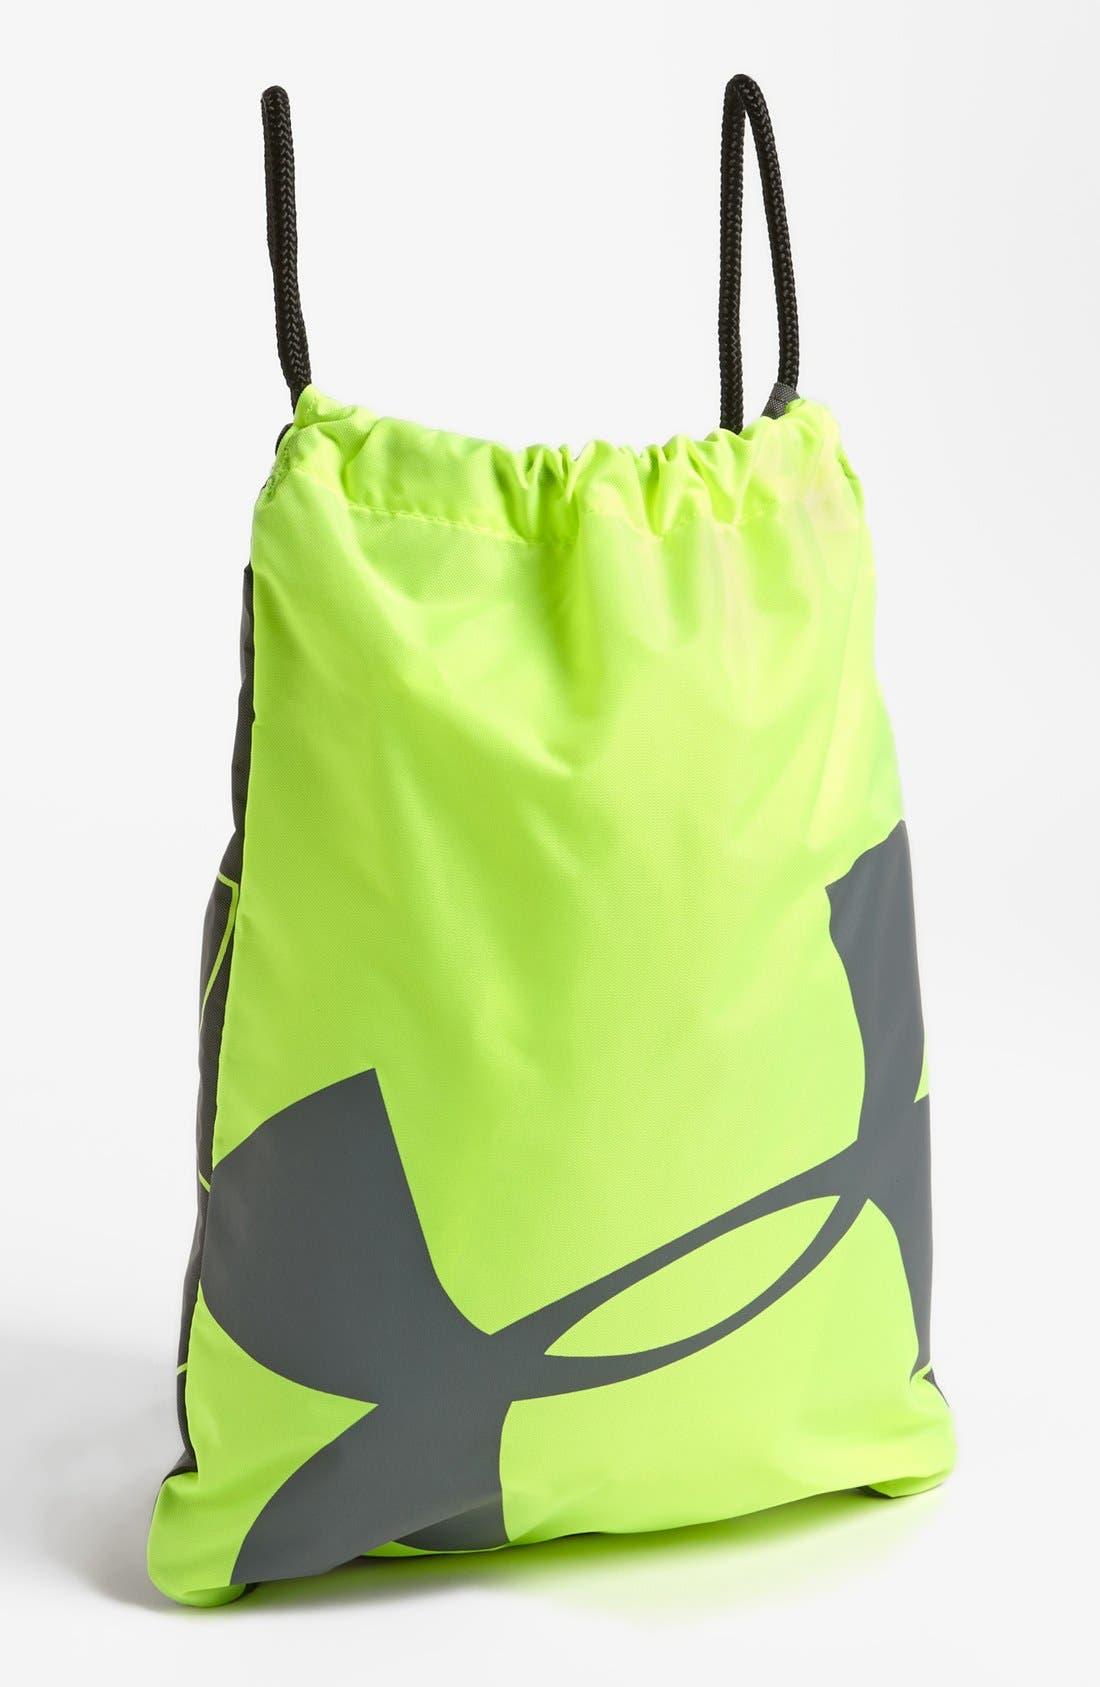 Alternate Image 1 Selected - Under Armour 'Dauntless' Drawstring Backpack